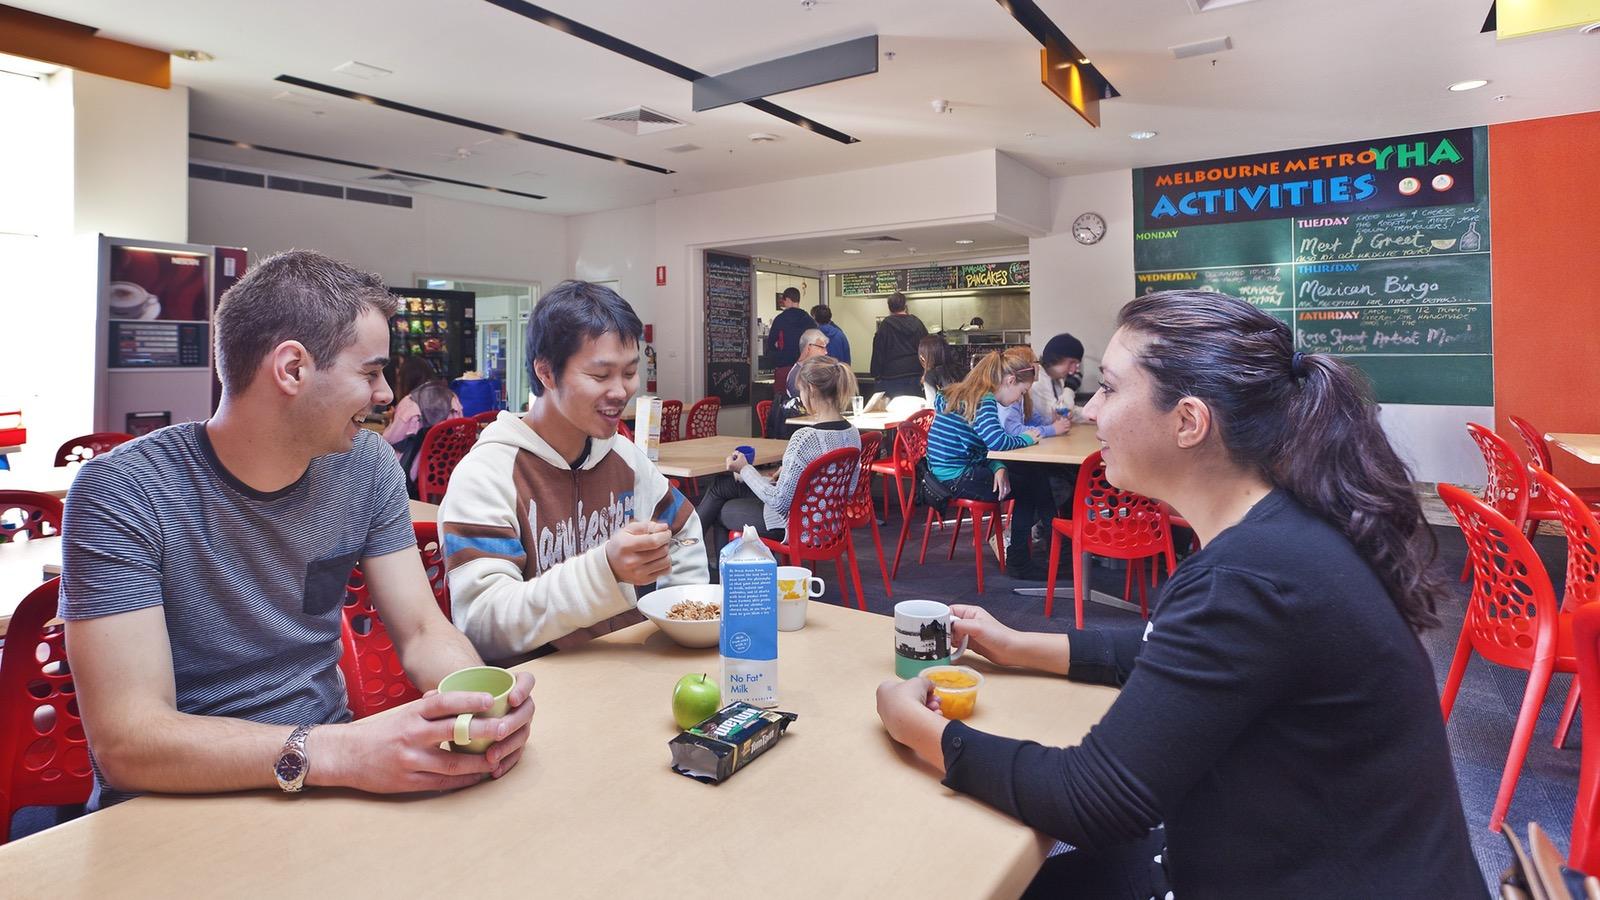 Melbourne Metro YHA dining area